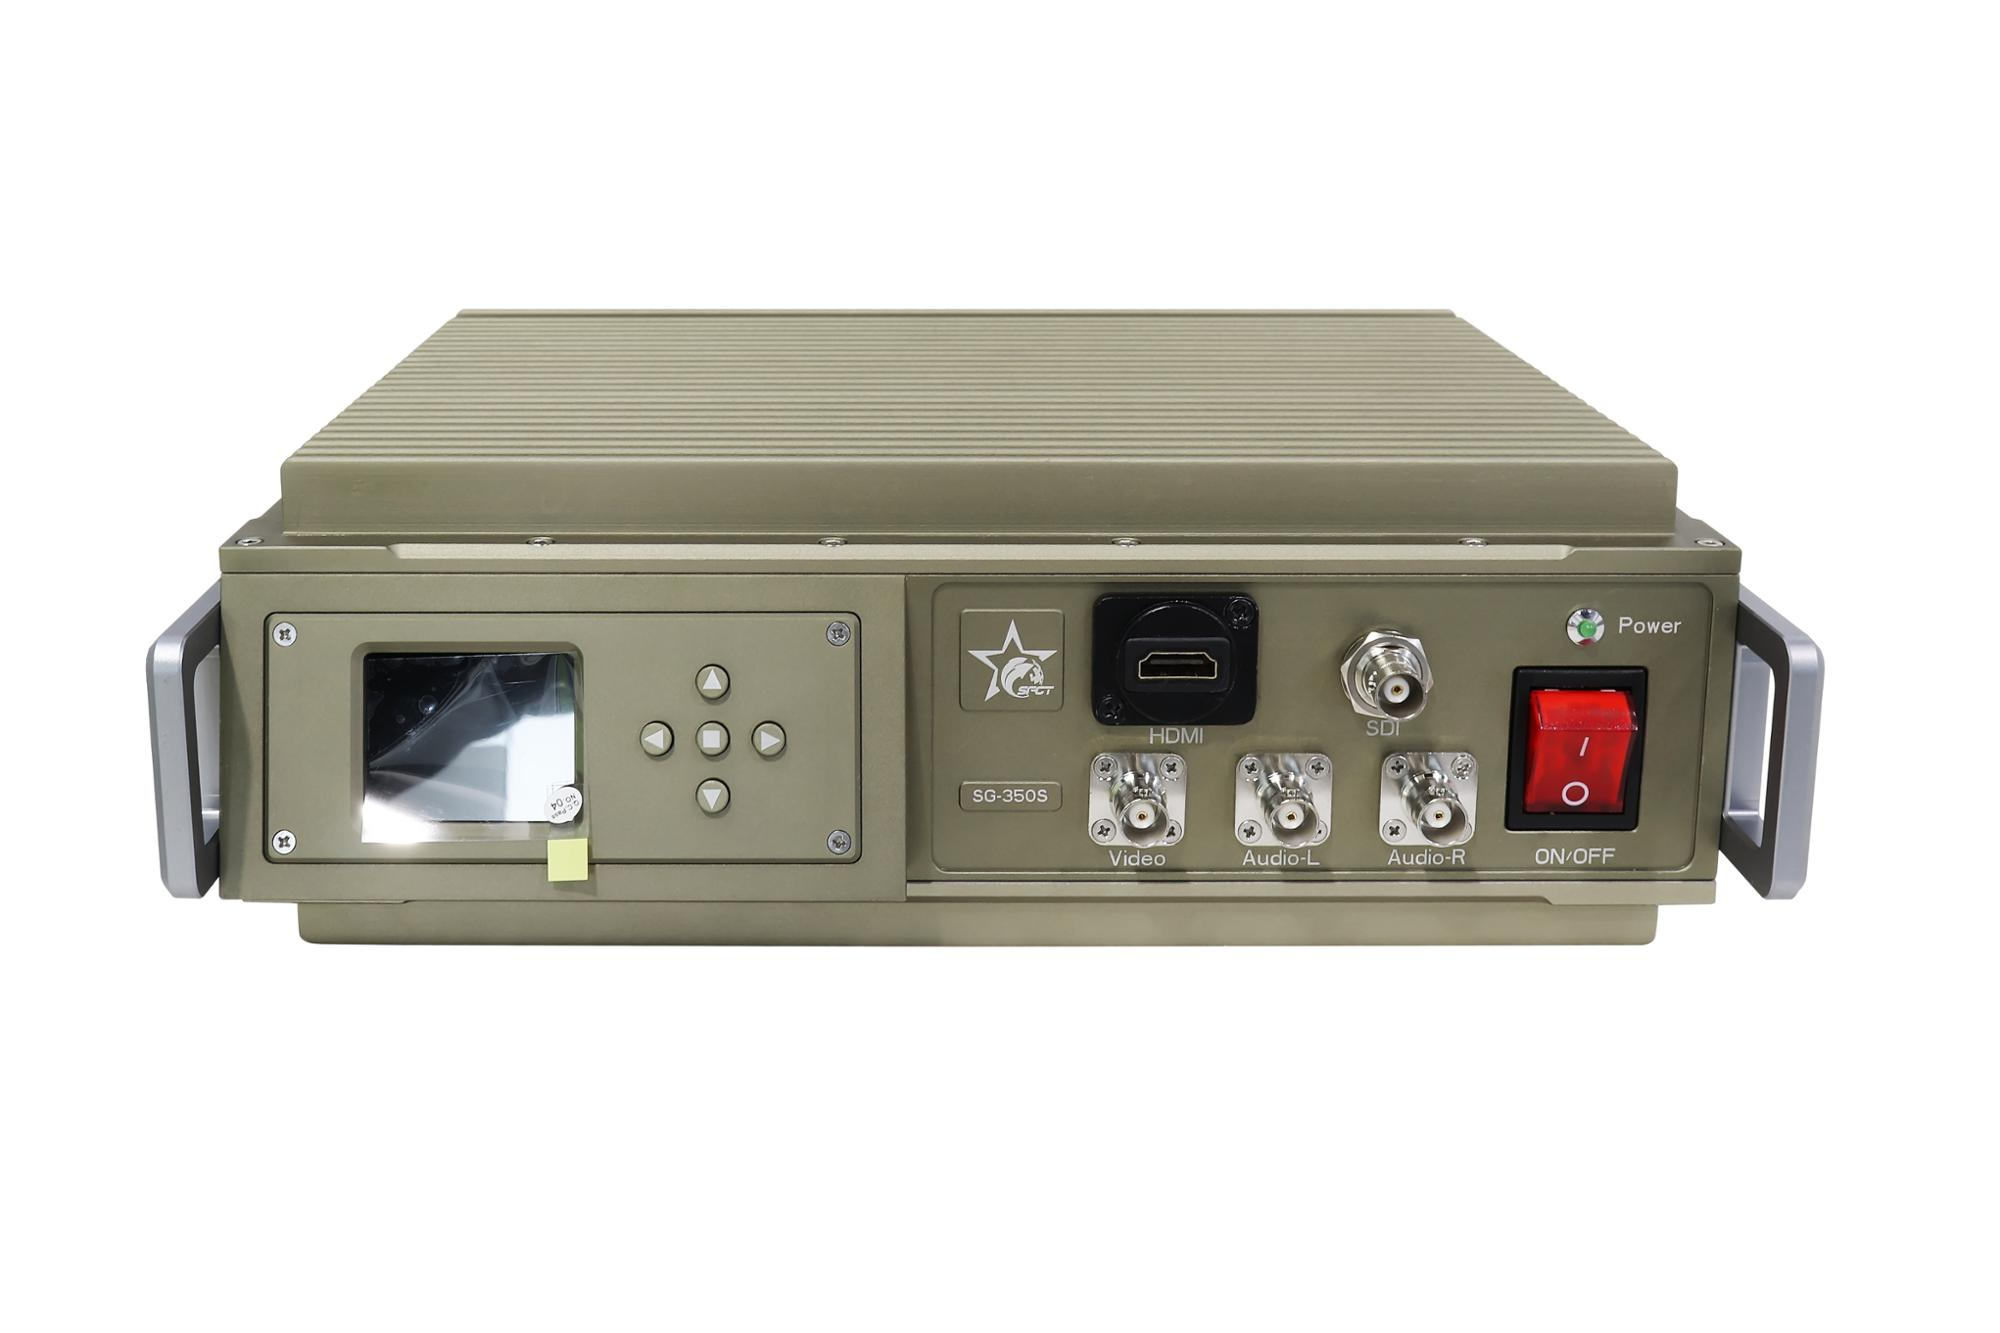 cofdm hd video transmitter.jpg